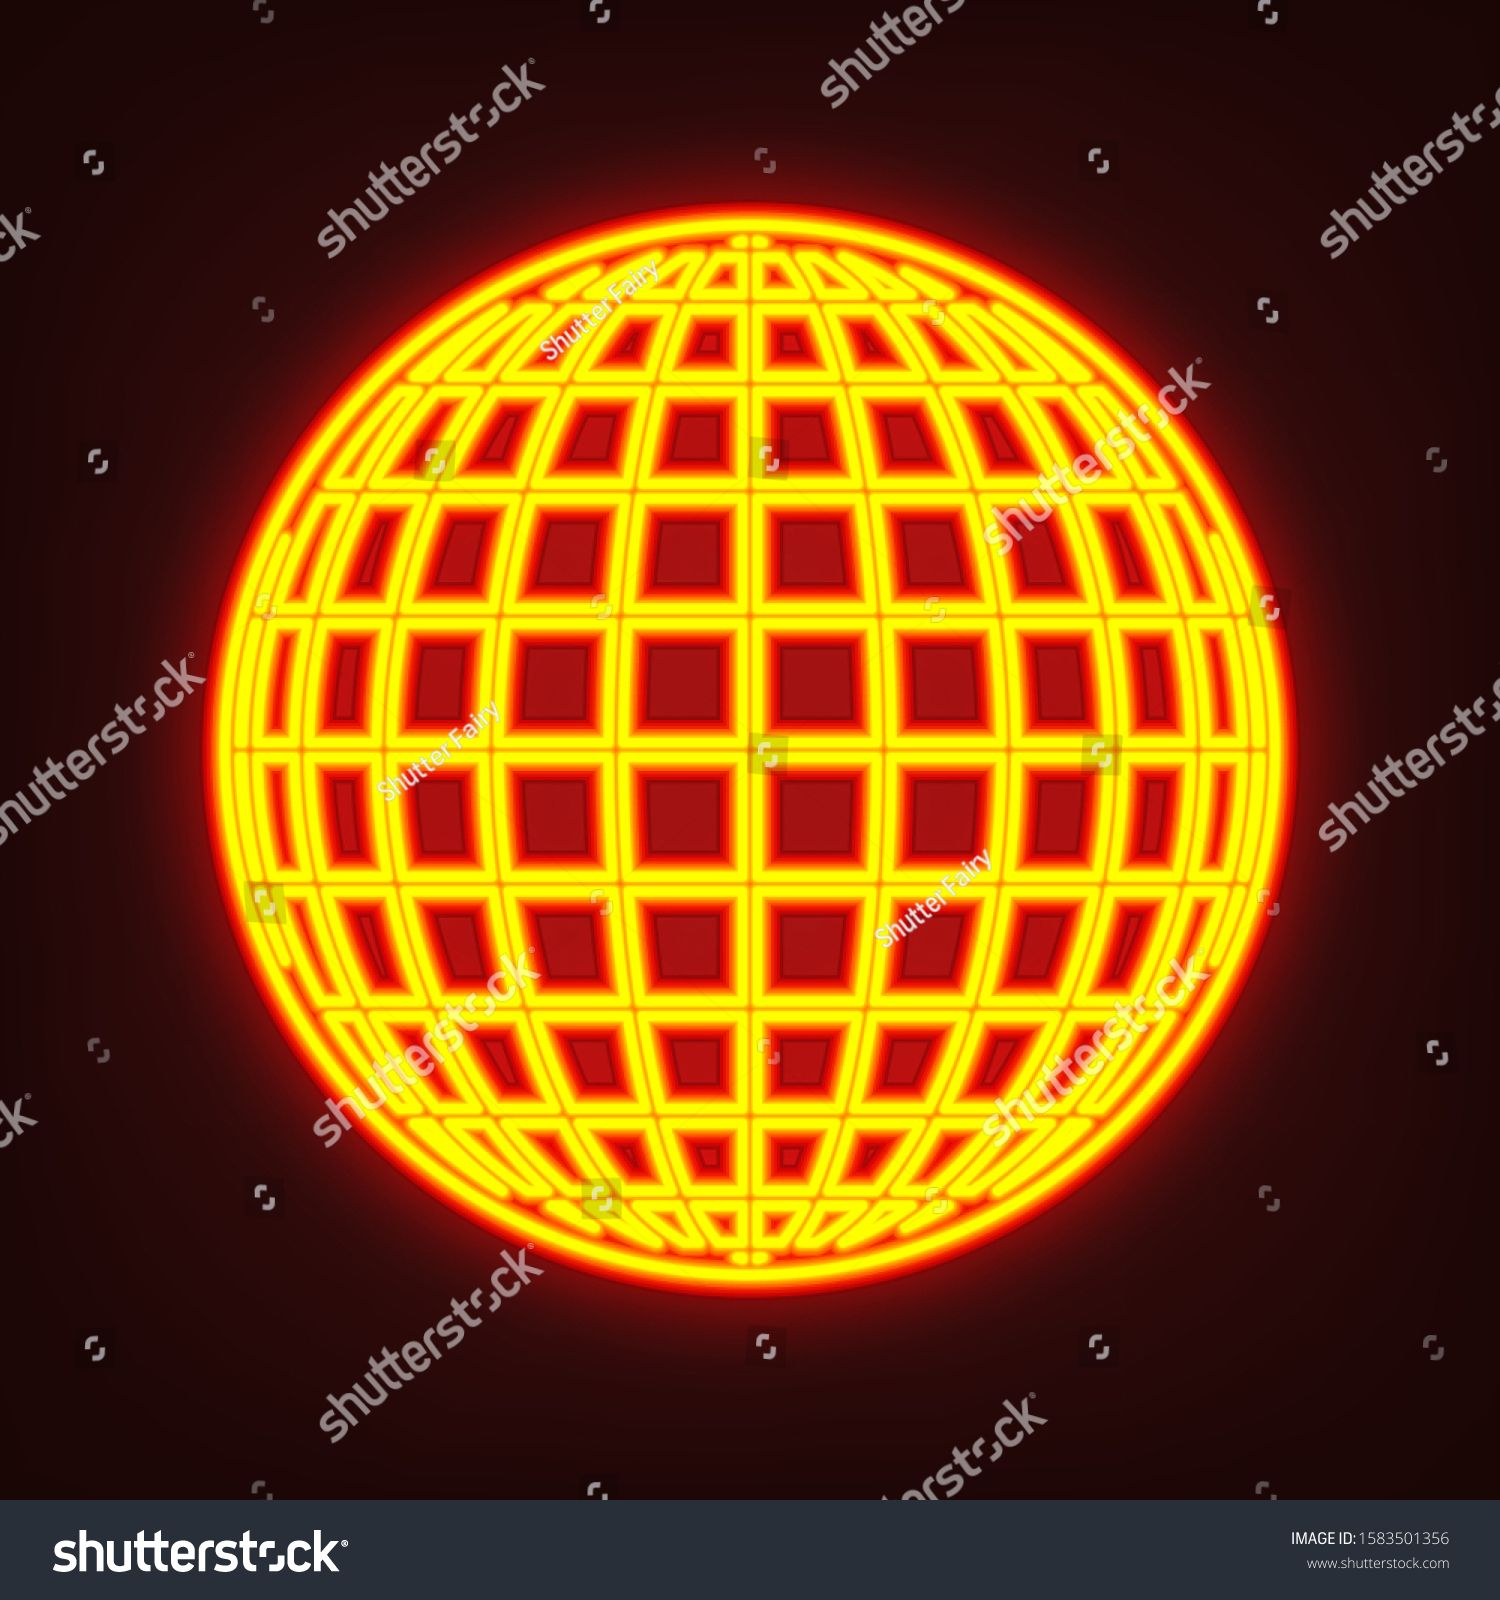 Globe Sign Illustration 11 Parallels And 11 Meridian Yellow Orange Red Neon Icon At Dark Reddish Background Illuminati In 2020 Globe Icon Illustration Icon Design